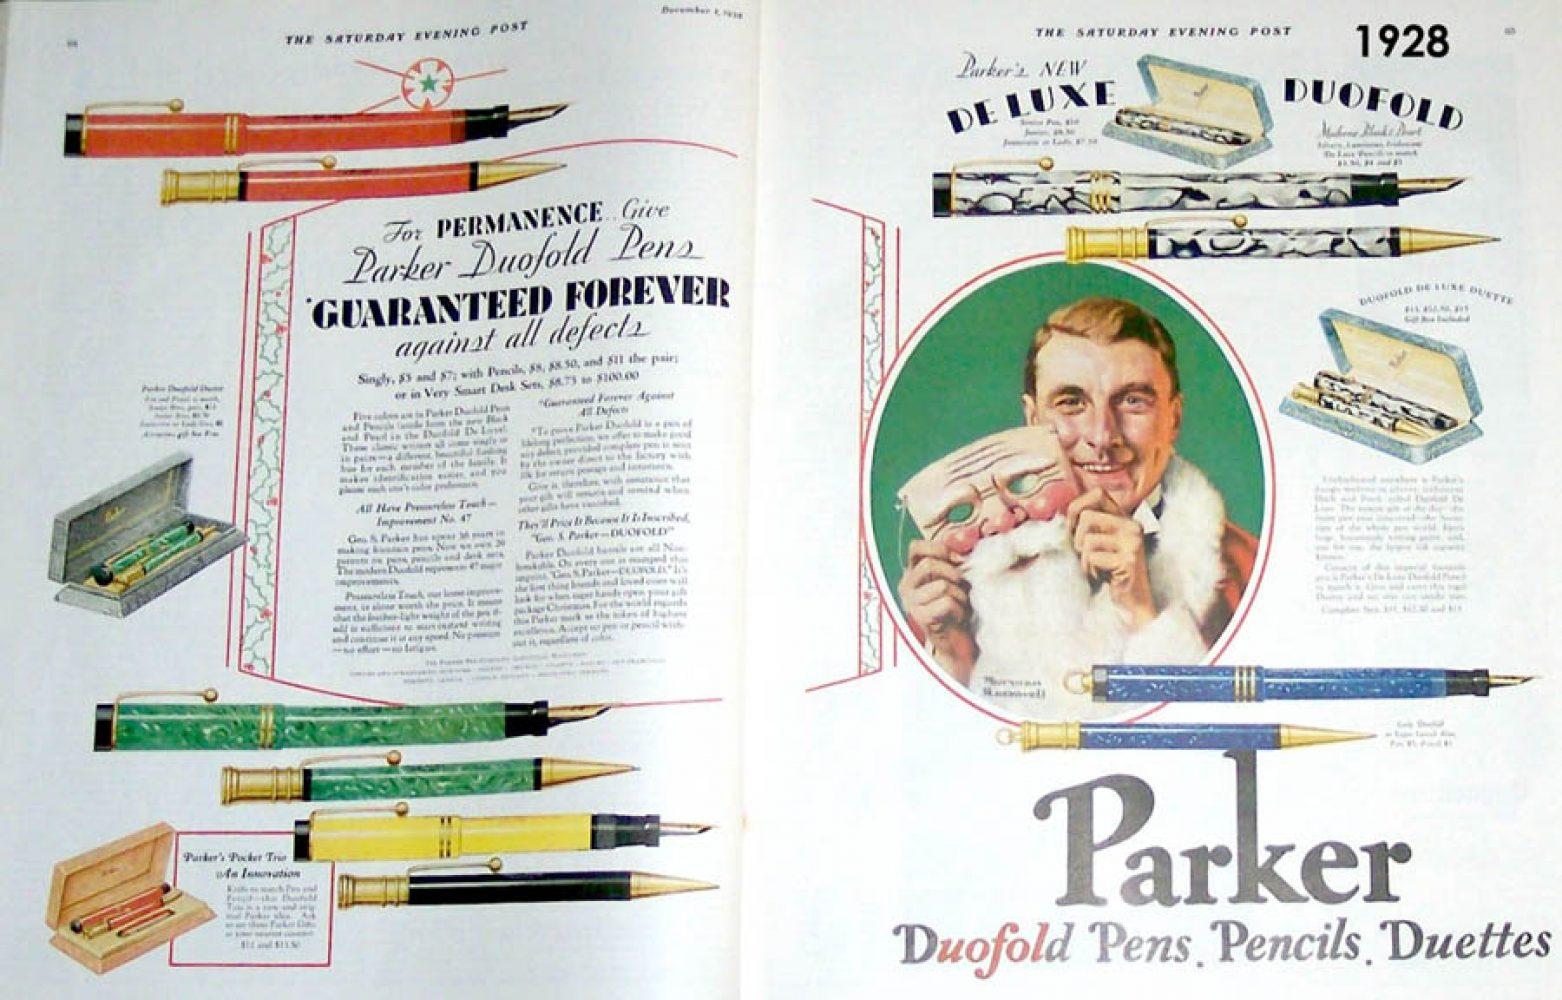 1928 12 01 Guaranteed forever